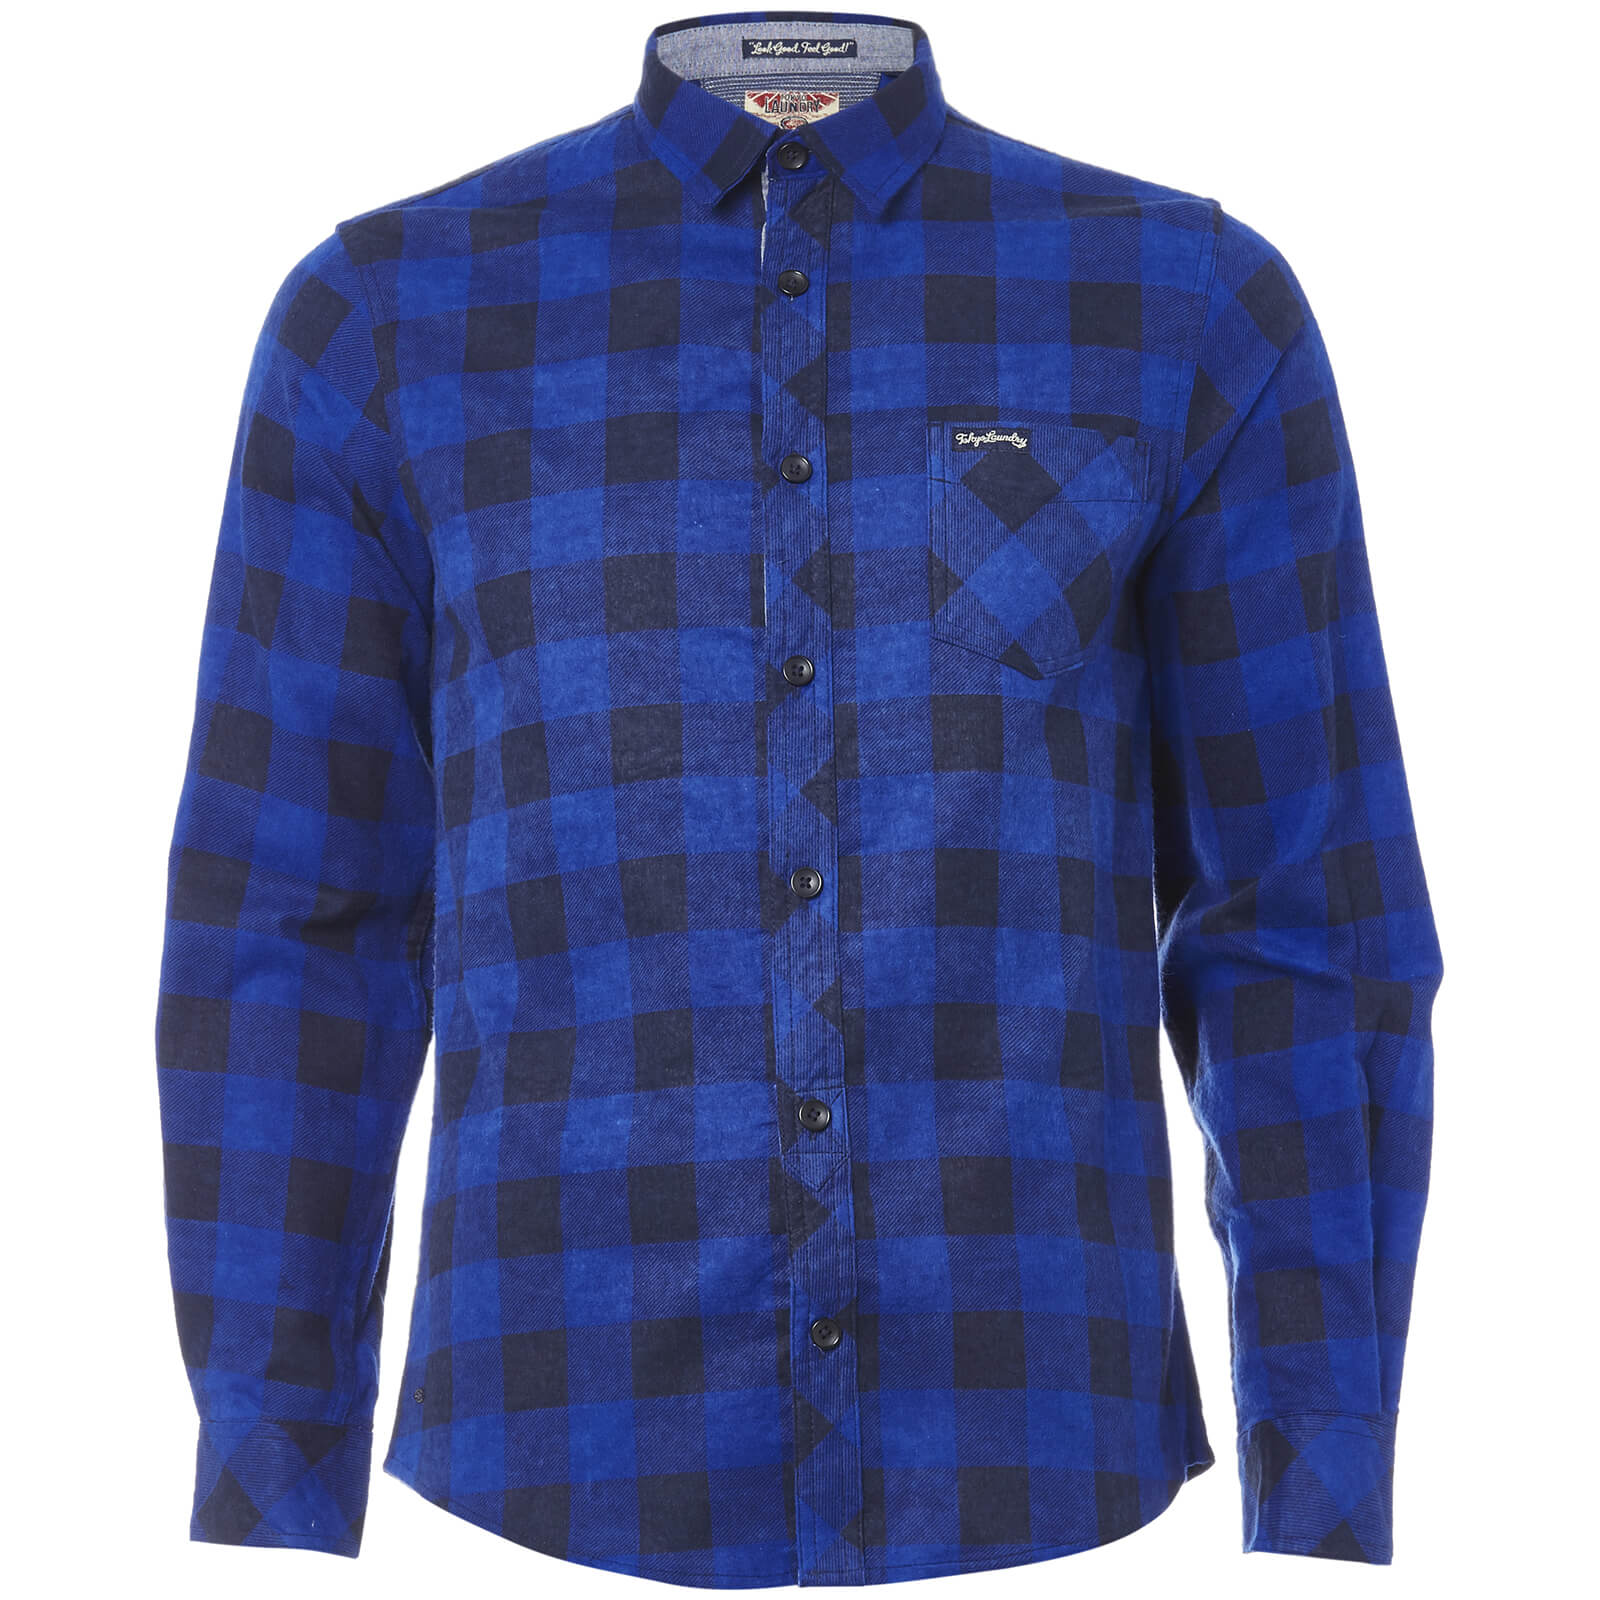 5e8ddadc63343 Chemise en Flanelle Homme Alhambra Tokyo Laundry - Bleu